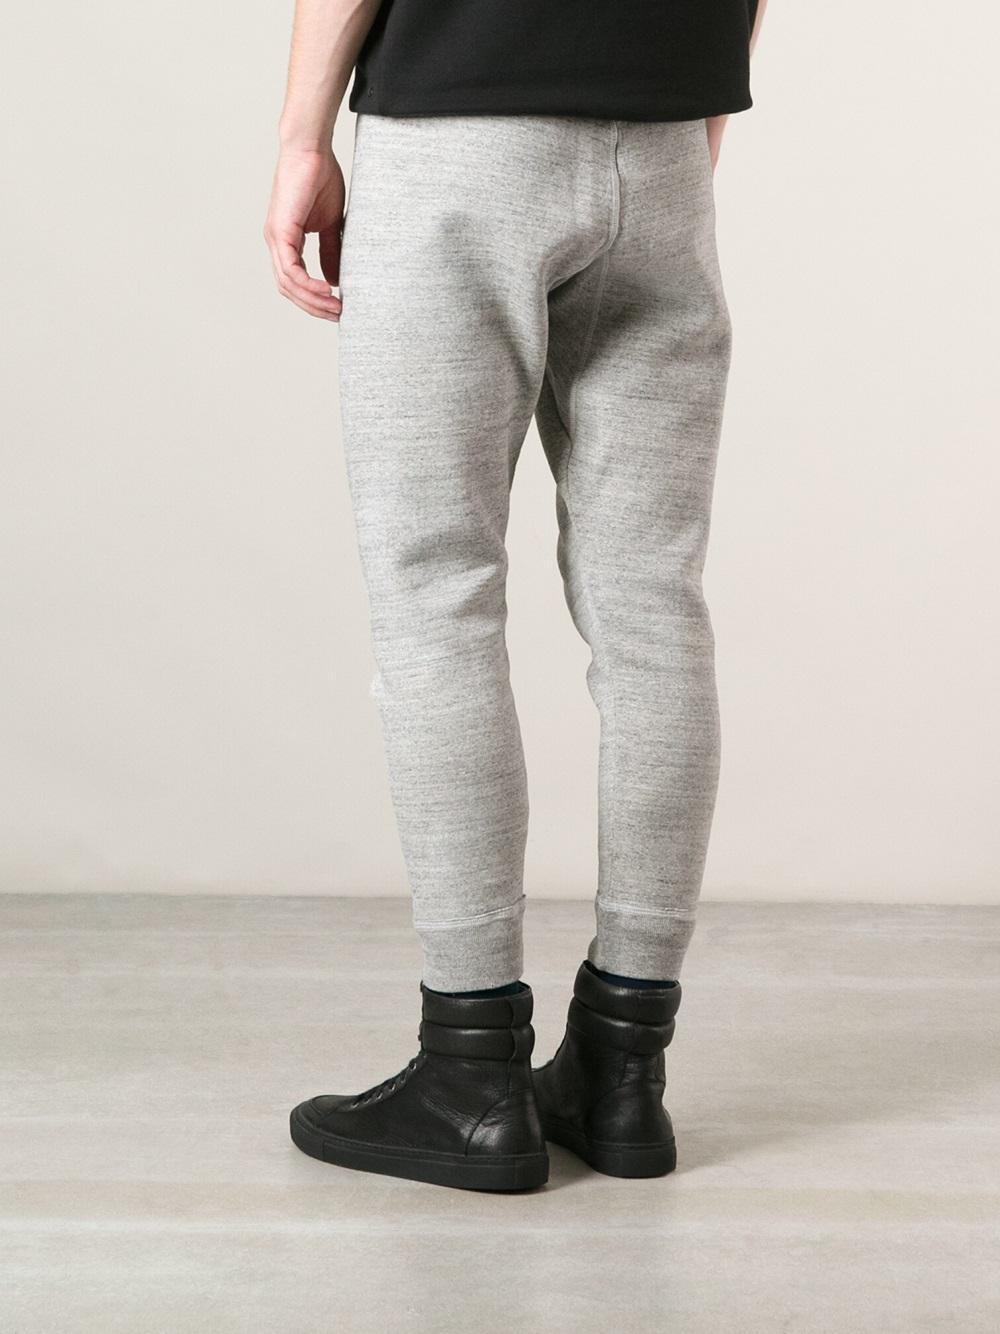 Celebrity camo pants